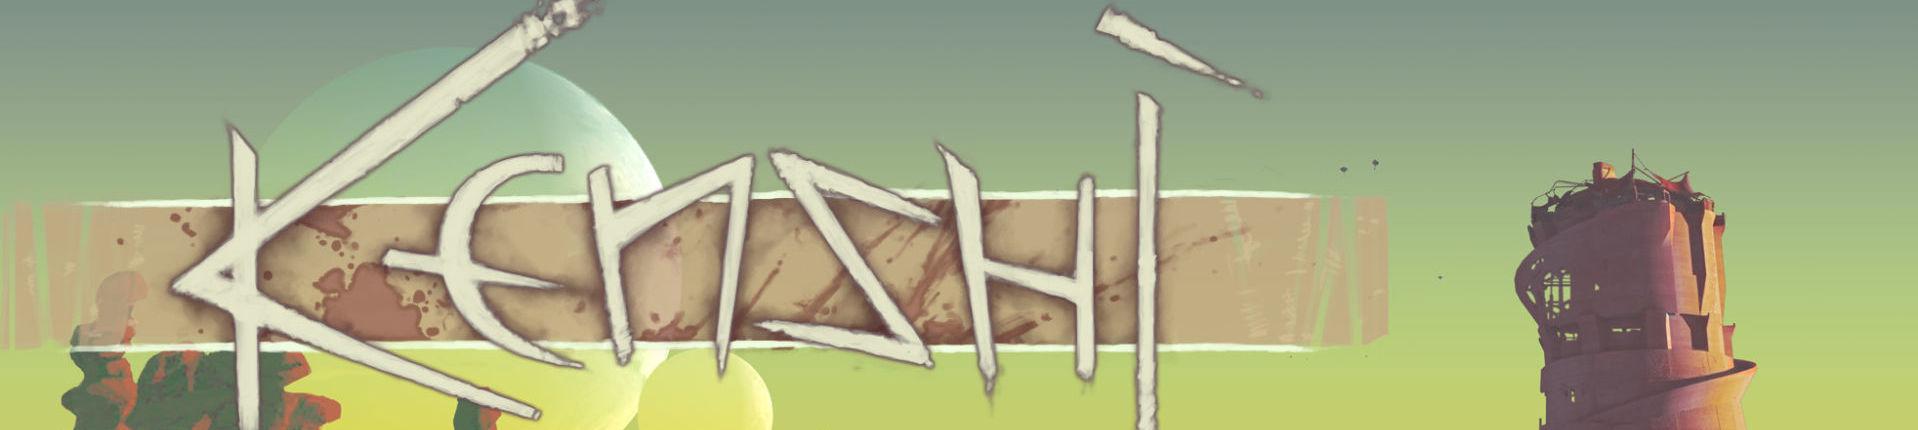 <a href='https://www.mightygamesmag.de/all-game-list/kenshi/'>Zum Spiel</a>